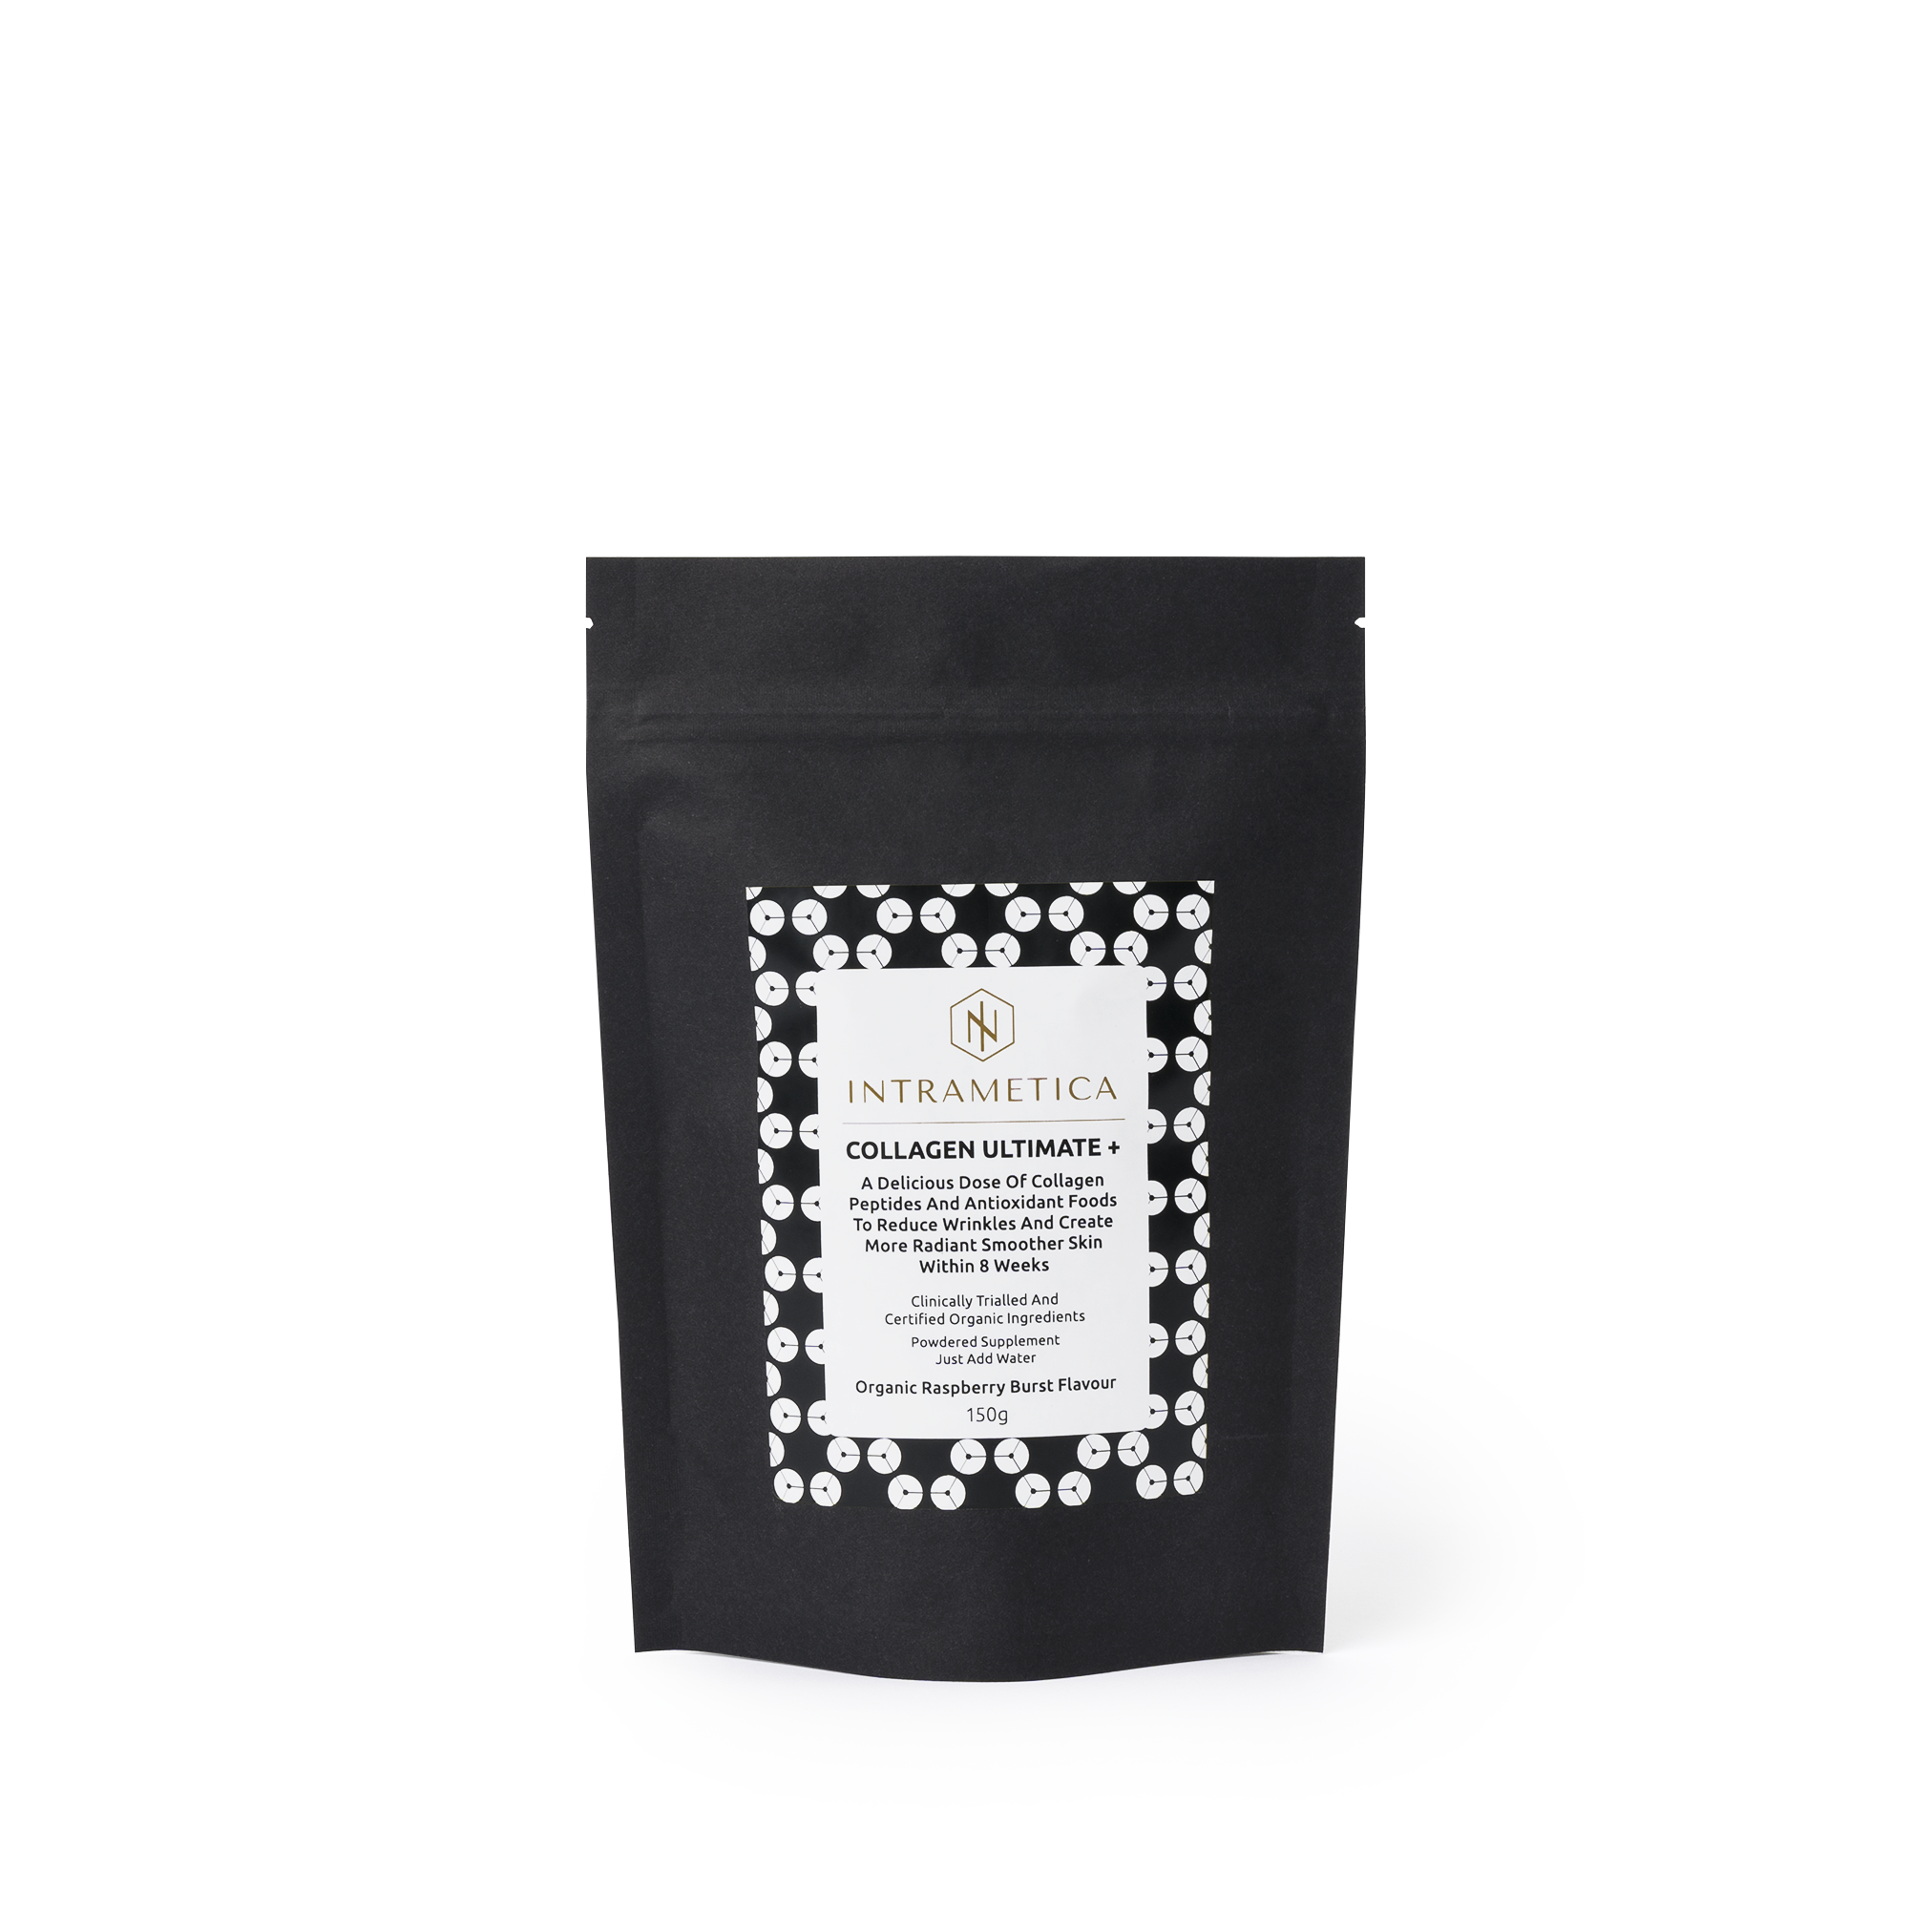 Intrametica Collagen Ultimate+ Pouch | 150g Organic Raspberry Burst